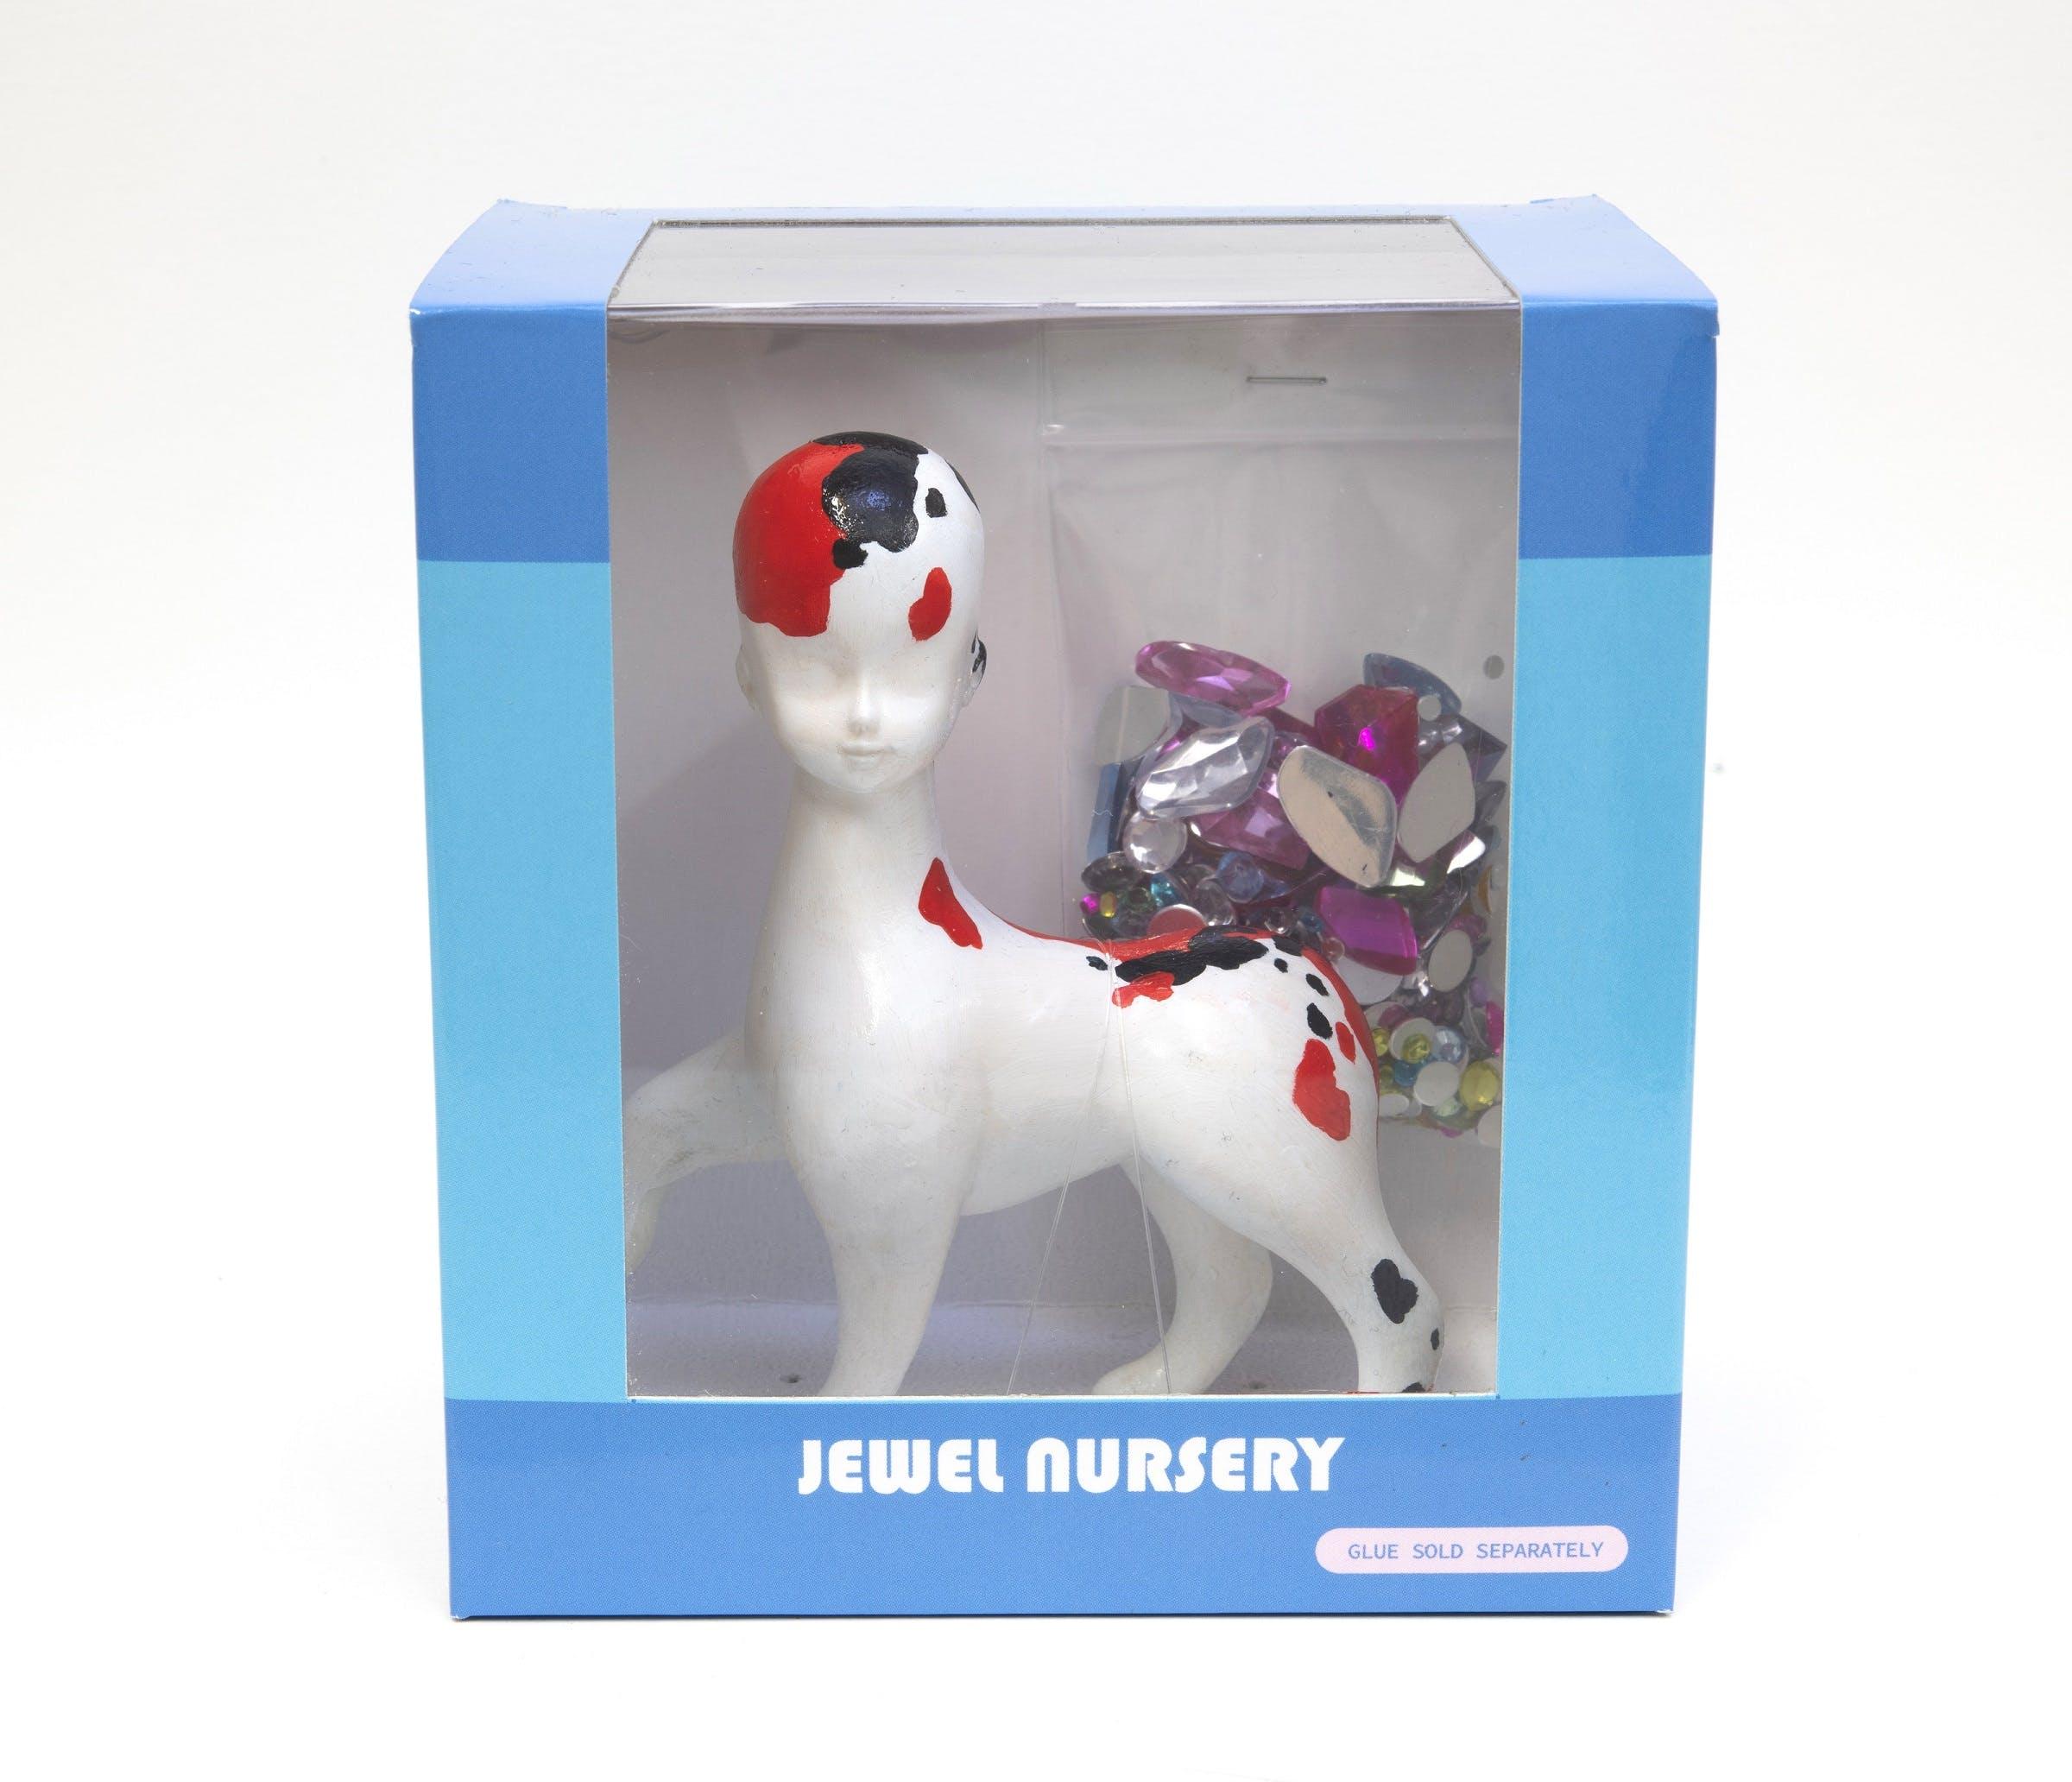 Jewel nursery/trycolor